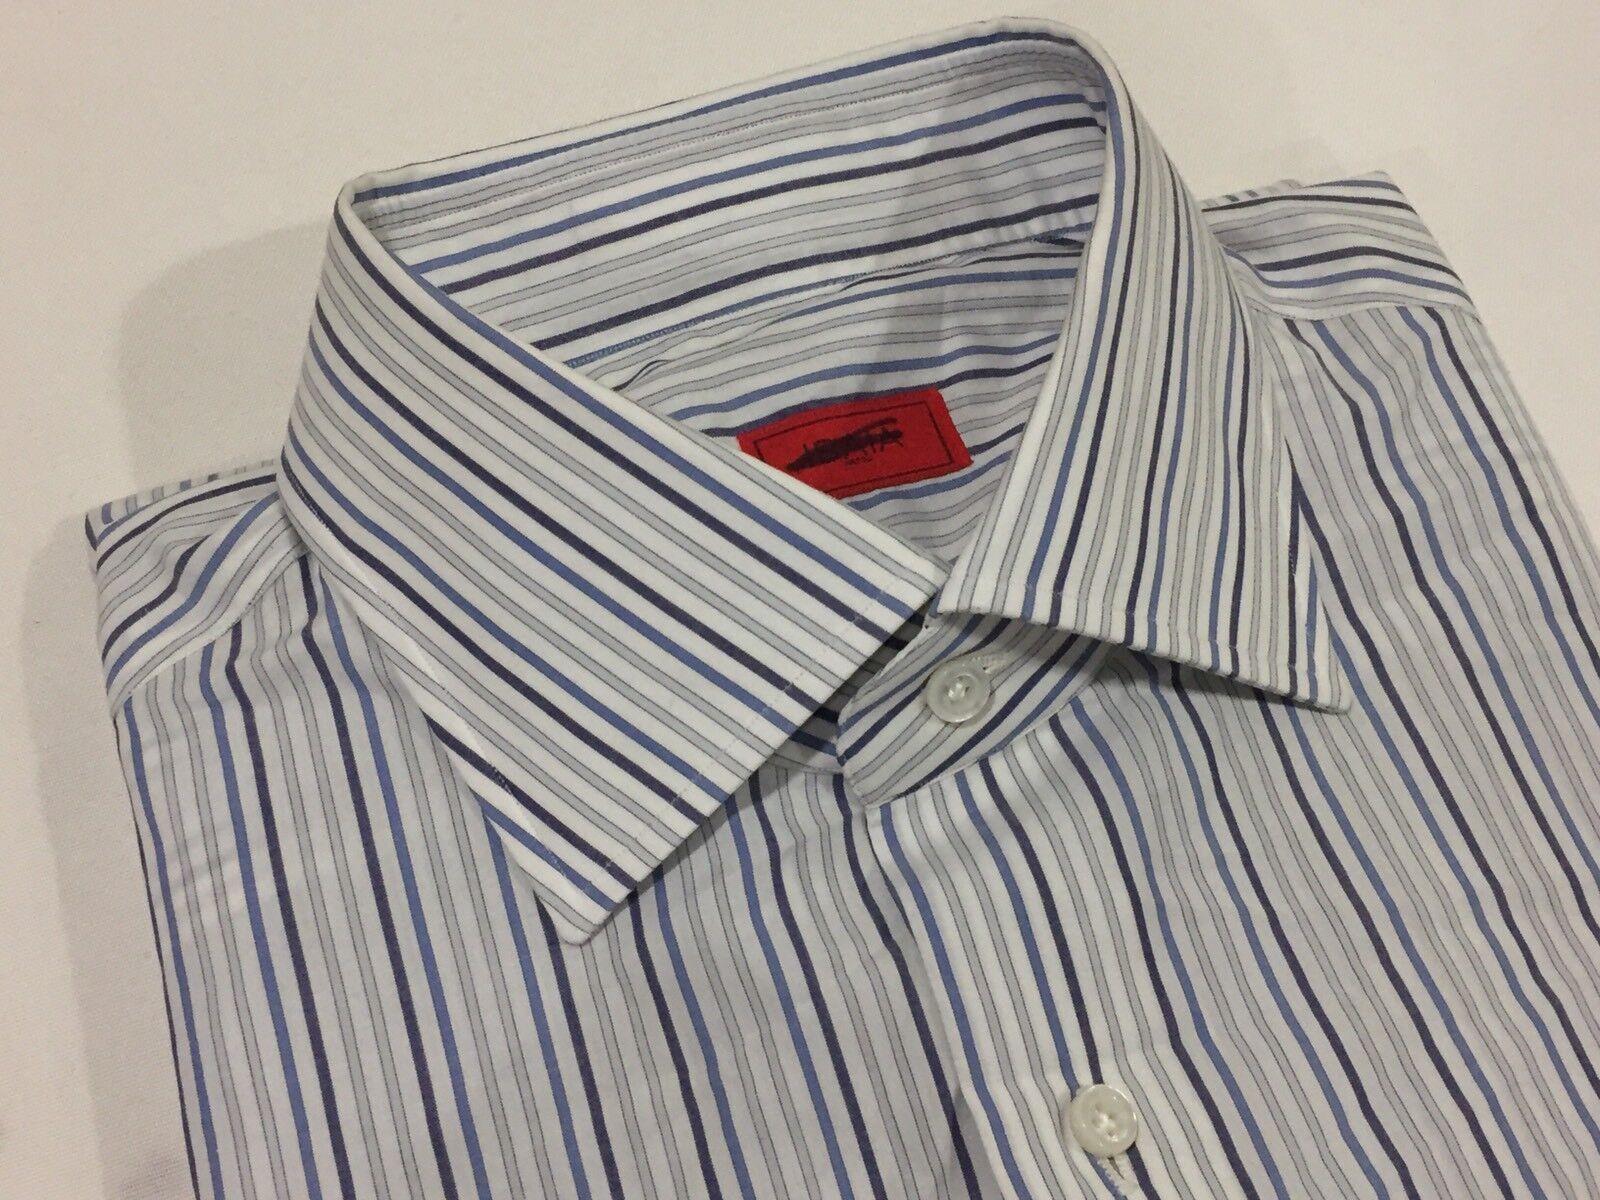 Authentic Brand New Isaia Striped Dress Shirt Größe 41/16 495.00